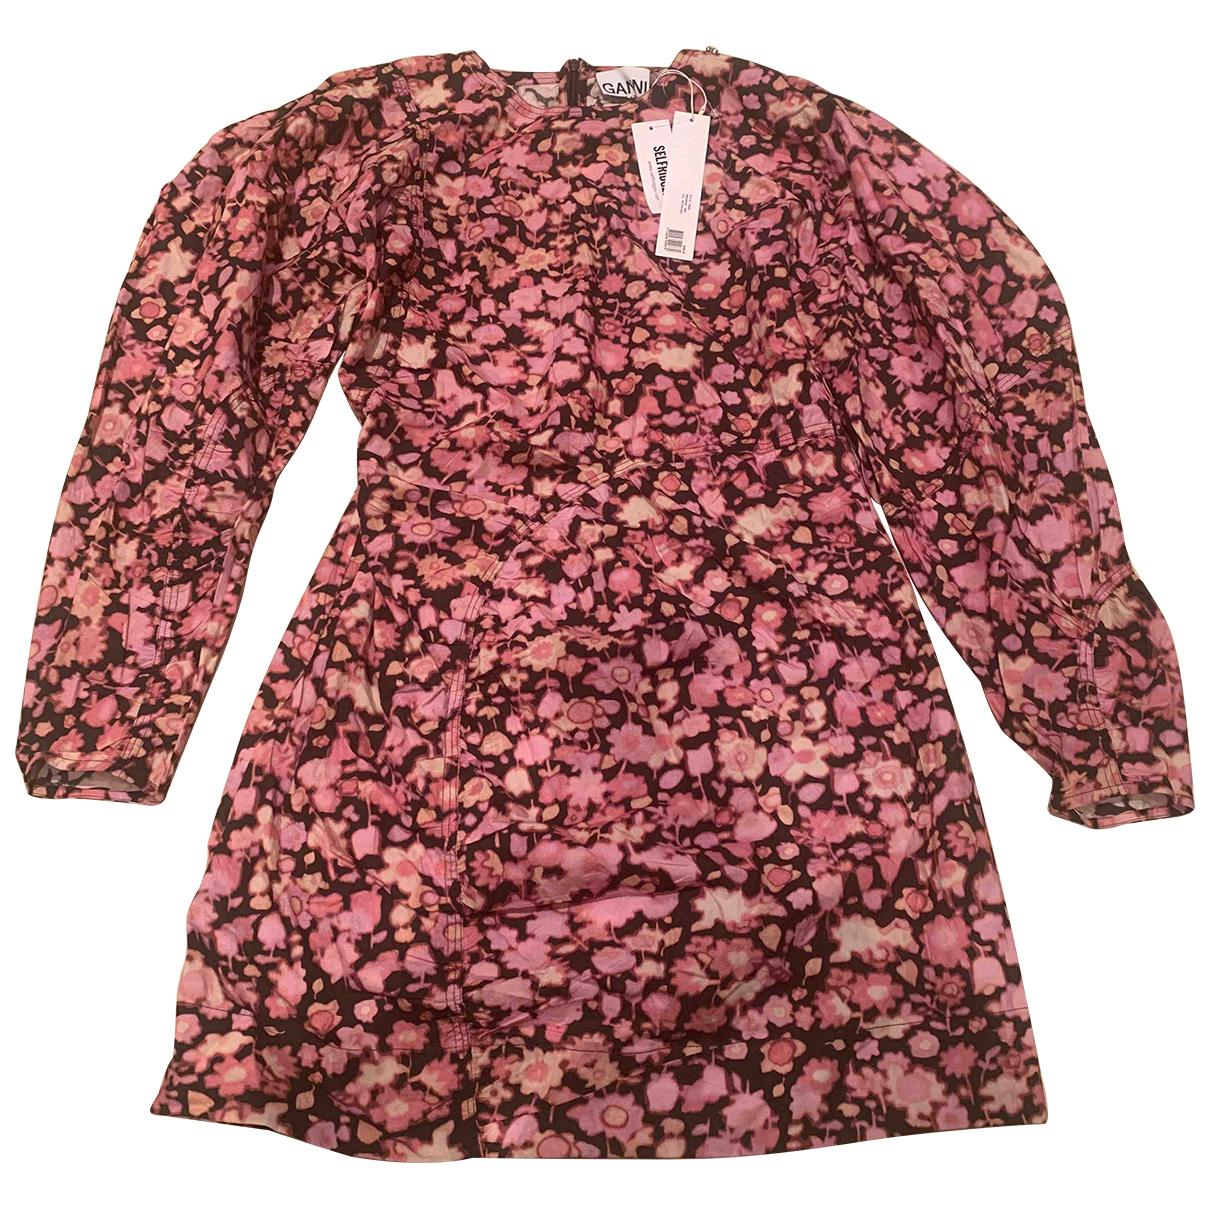 Ganni Spring Summer 2020 Kleid in  Lila Baumwolle